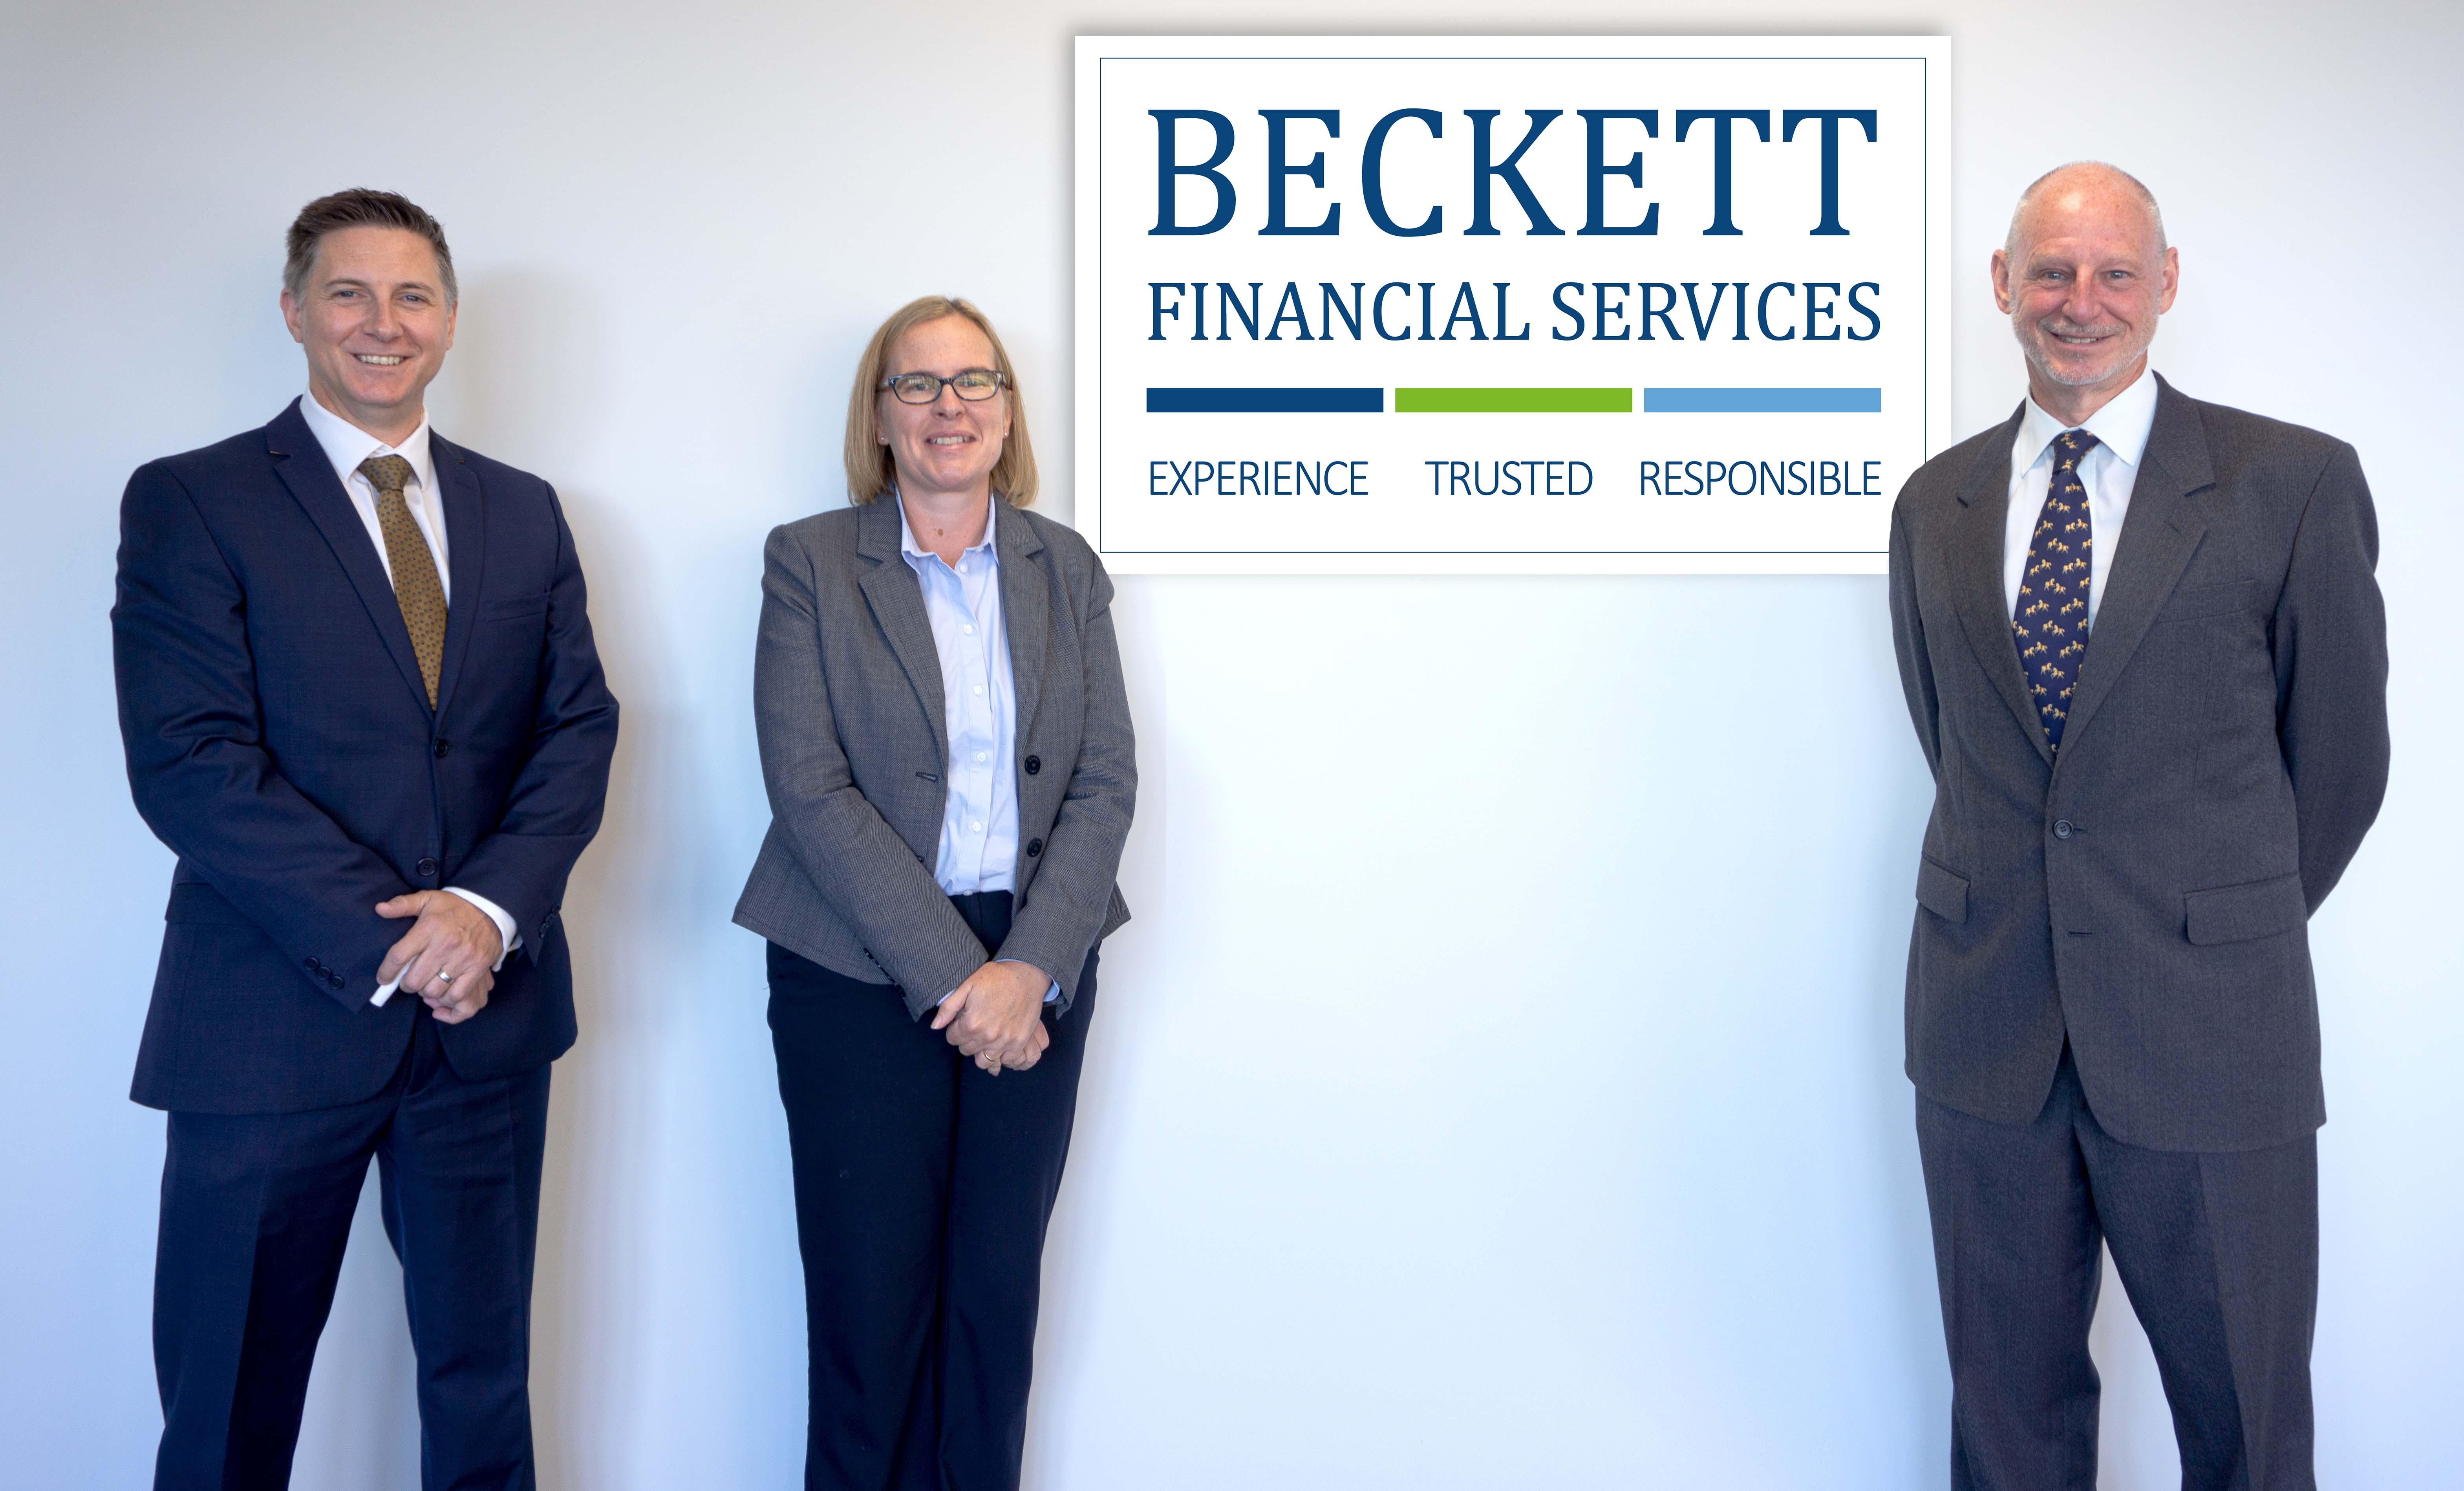 Becketts Acquires Felixstowe IFA